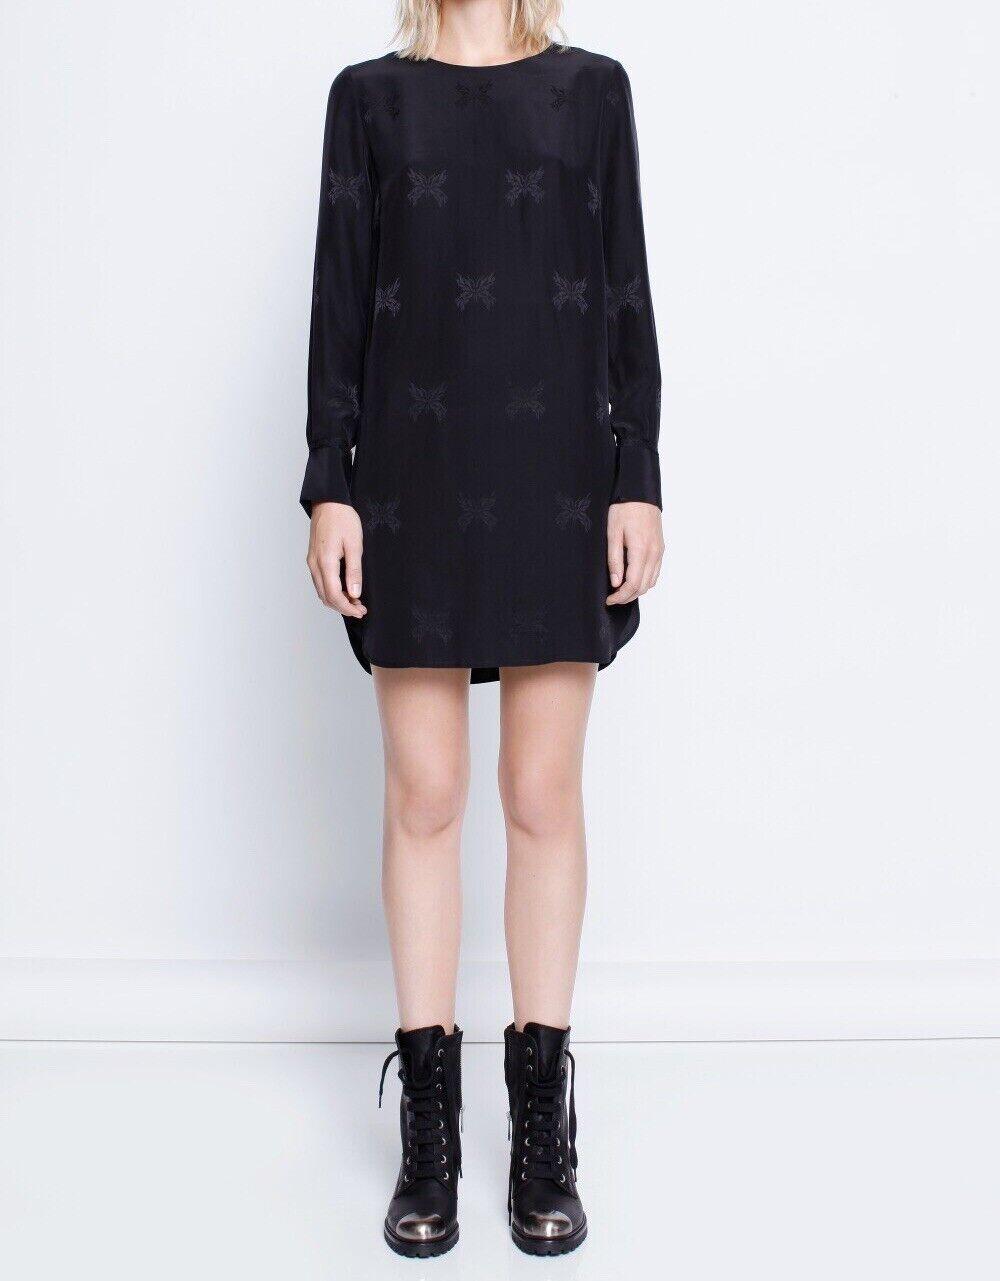 ZADIG & VOLTAIRE Rive Jac schwarz Long Sleeve Silk Dress W Logo Buttons Größe M